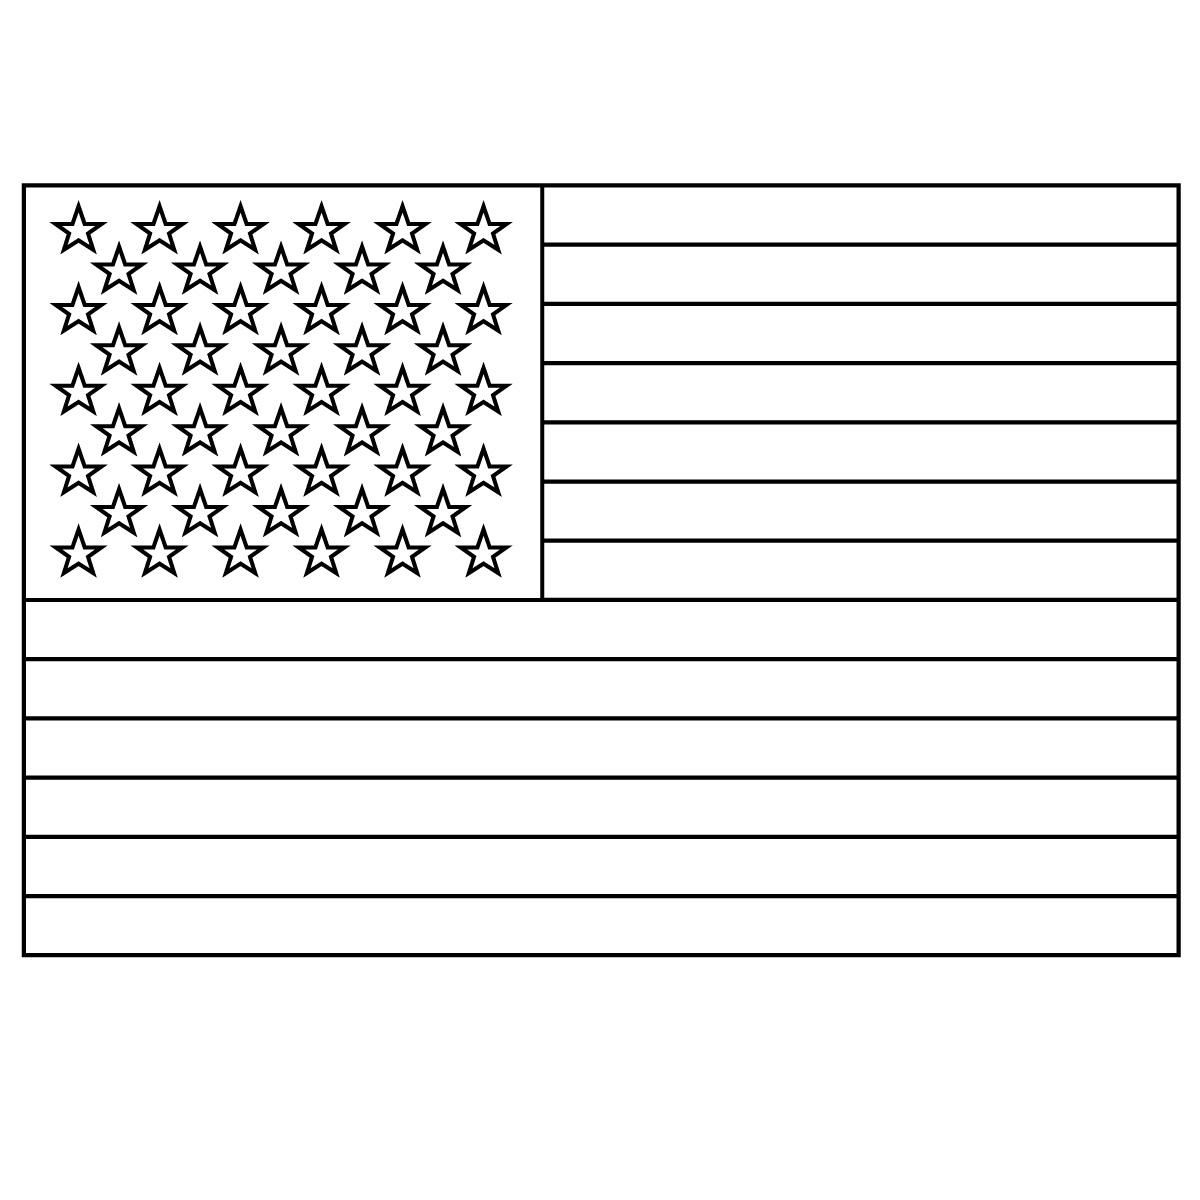 USA clipart america Clipart Flag A 19552wall S